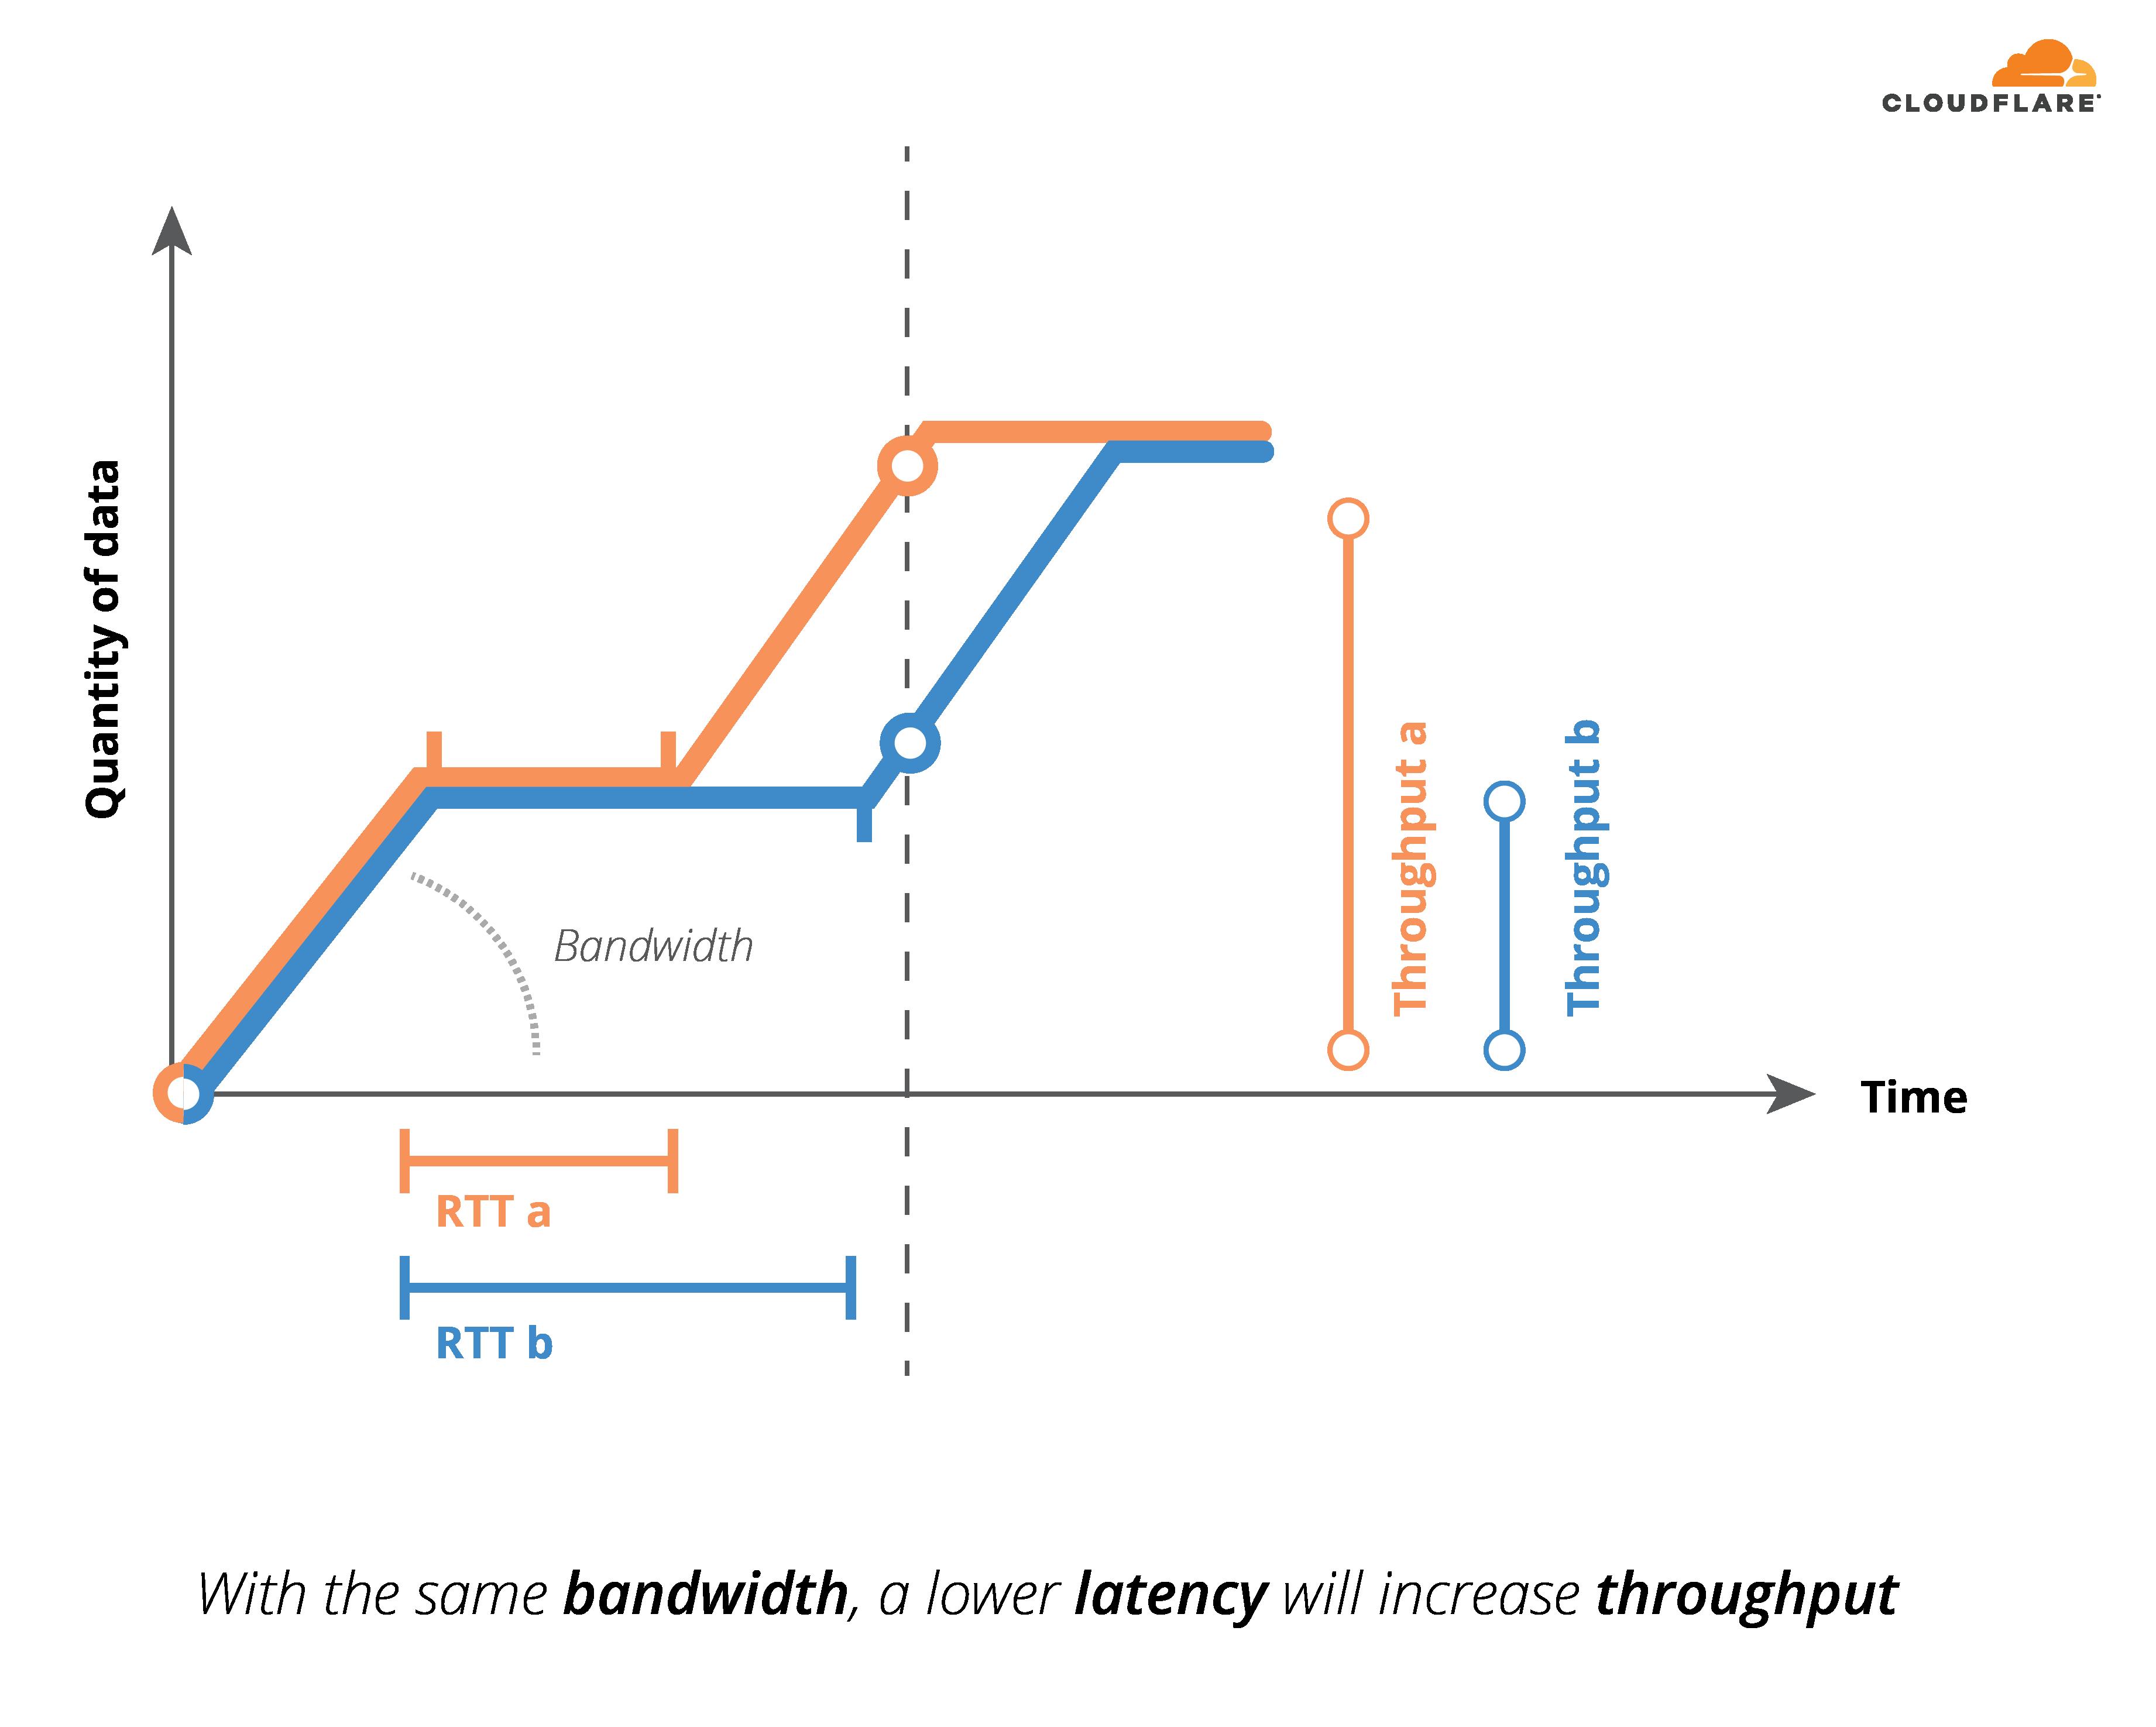 Impact of latency on throughput